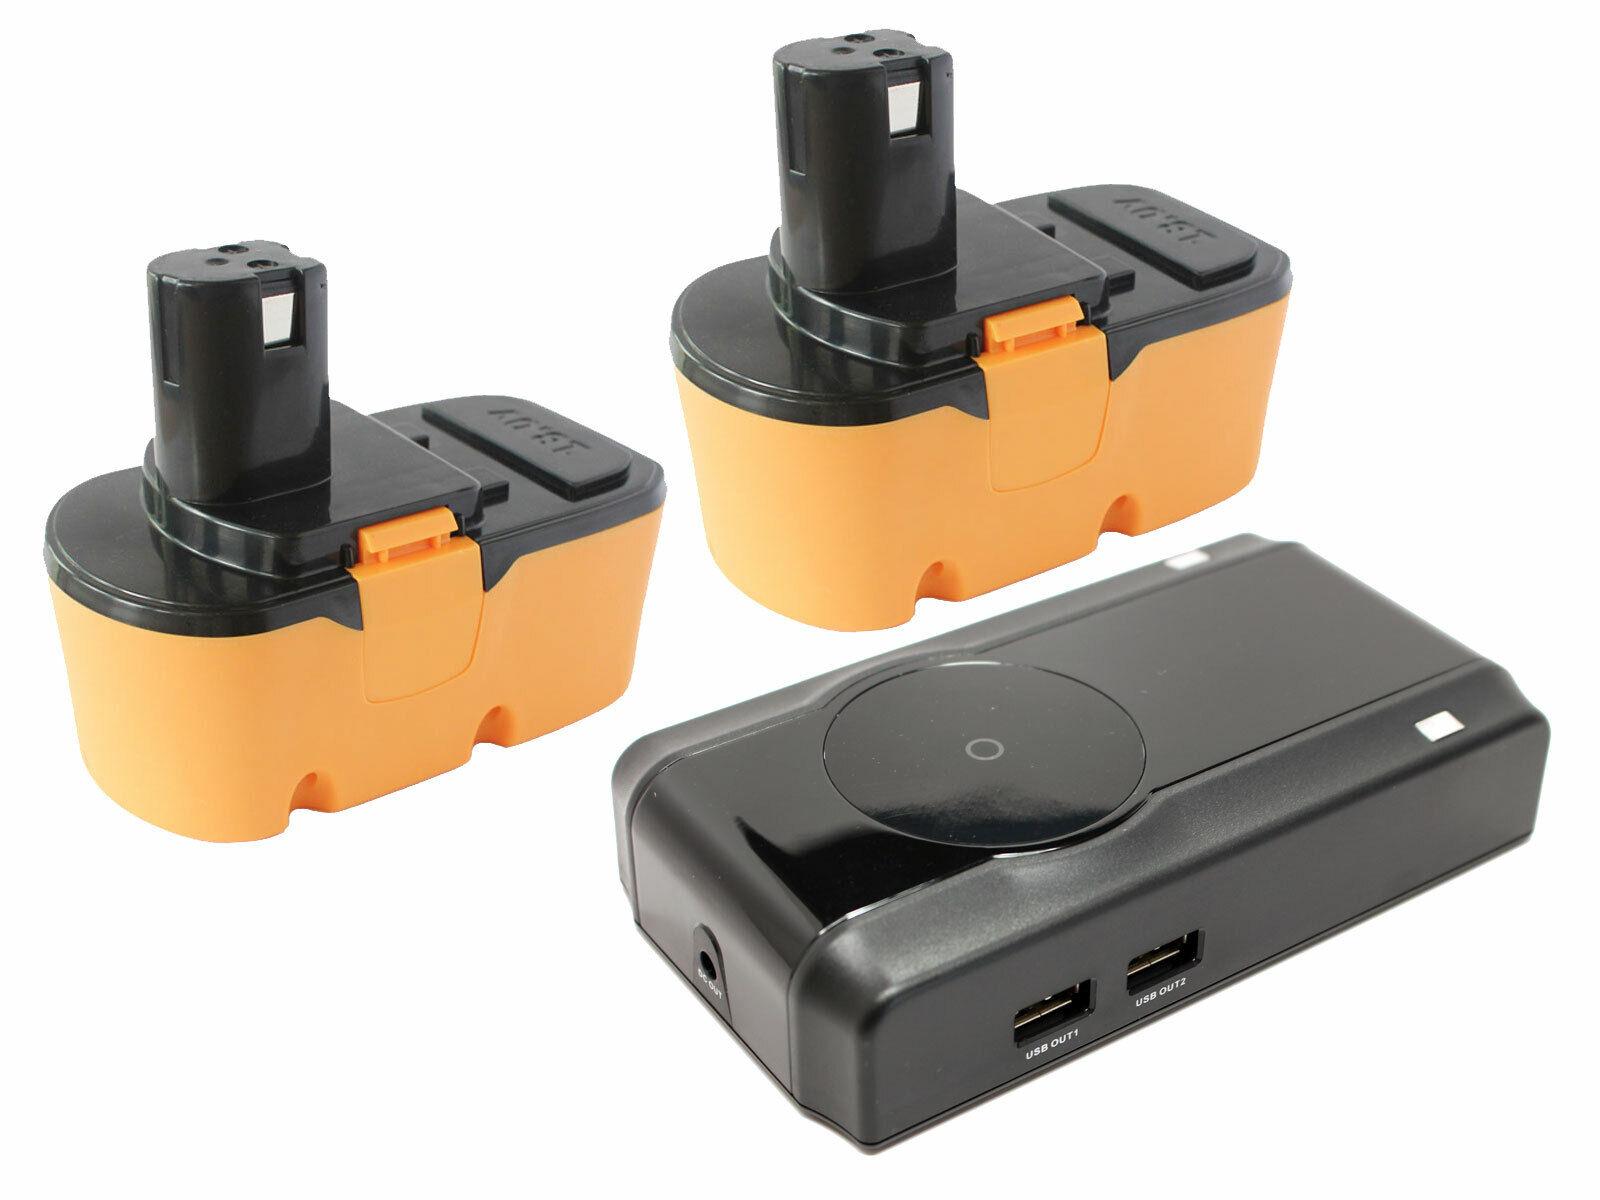 2x Ryobi 18V NICD Battery + Charger for Ryobi p100, p700, p400, p500, p220, p730